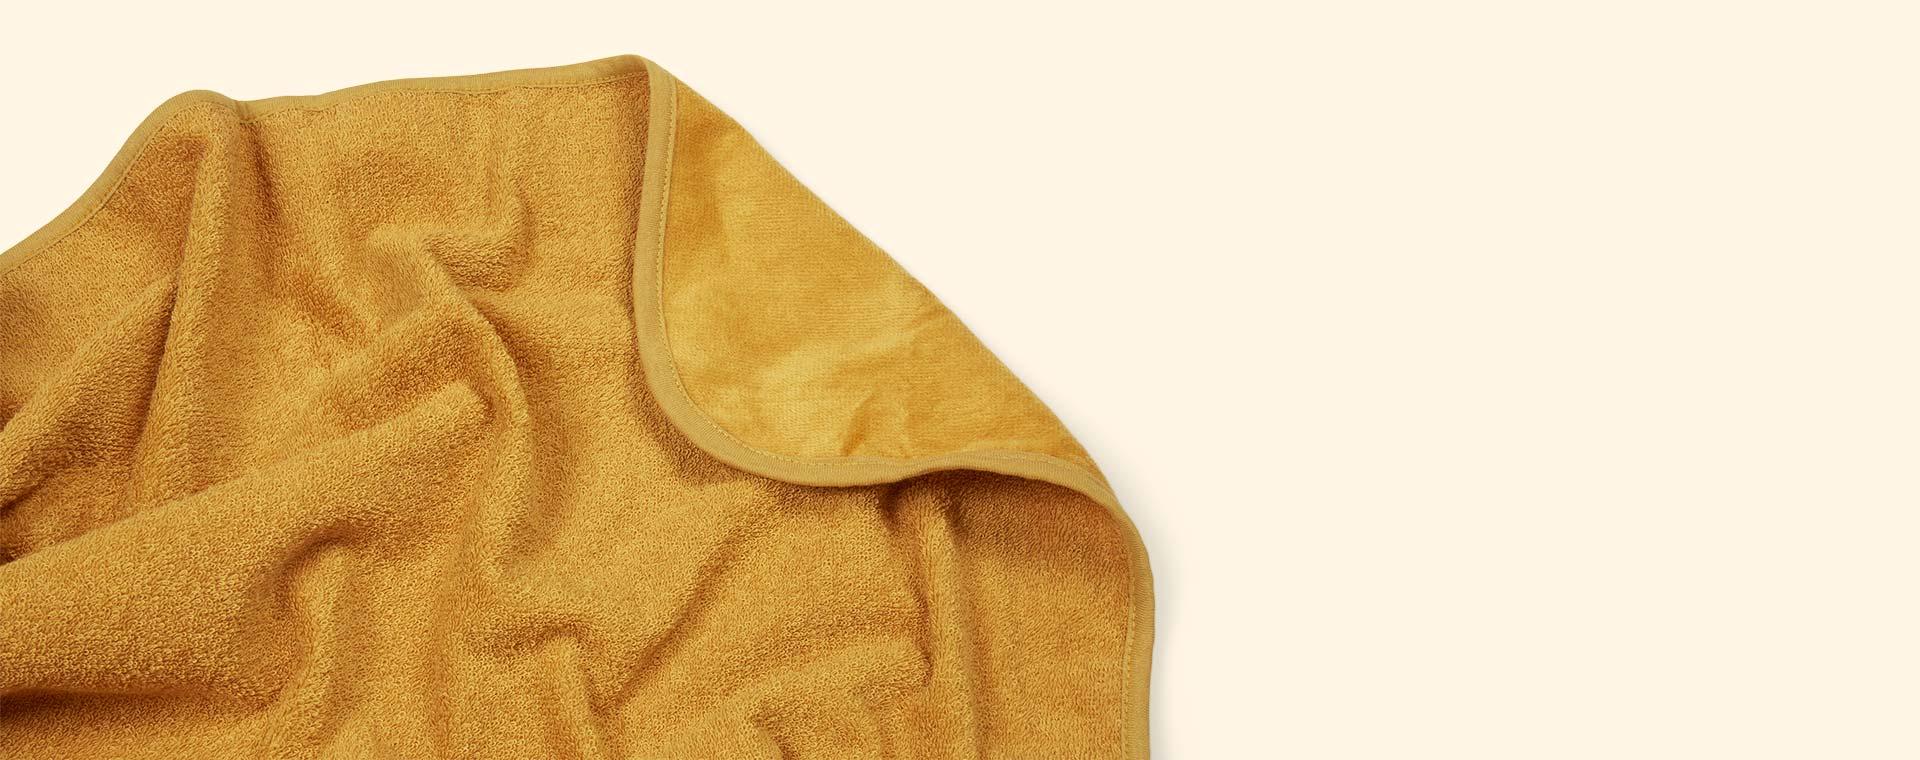 Multi Moulin Roty Hooded Towel Set